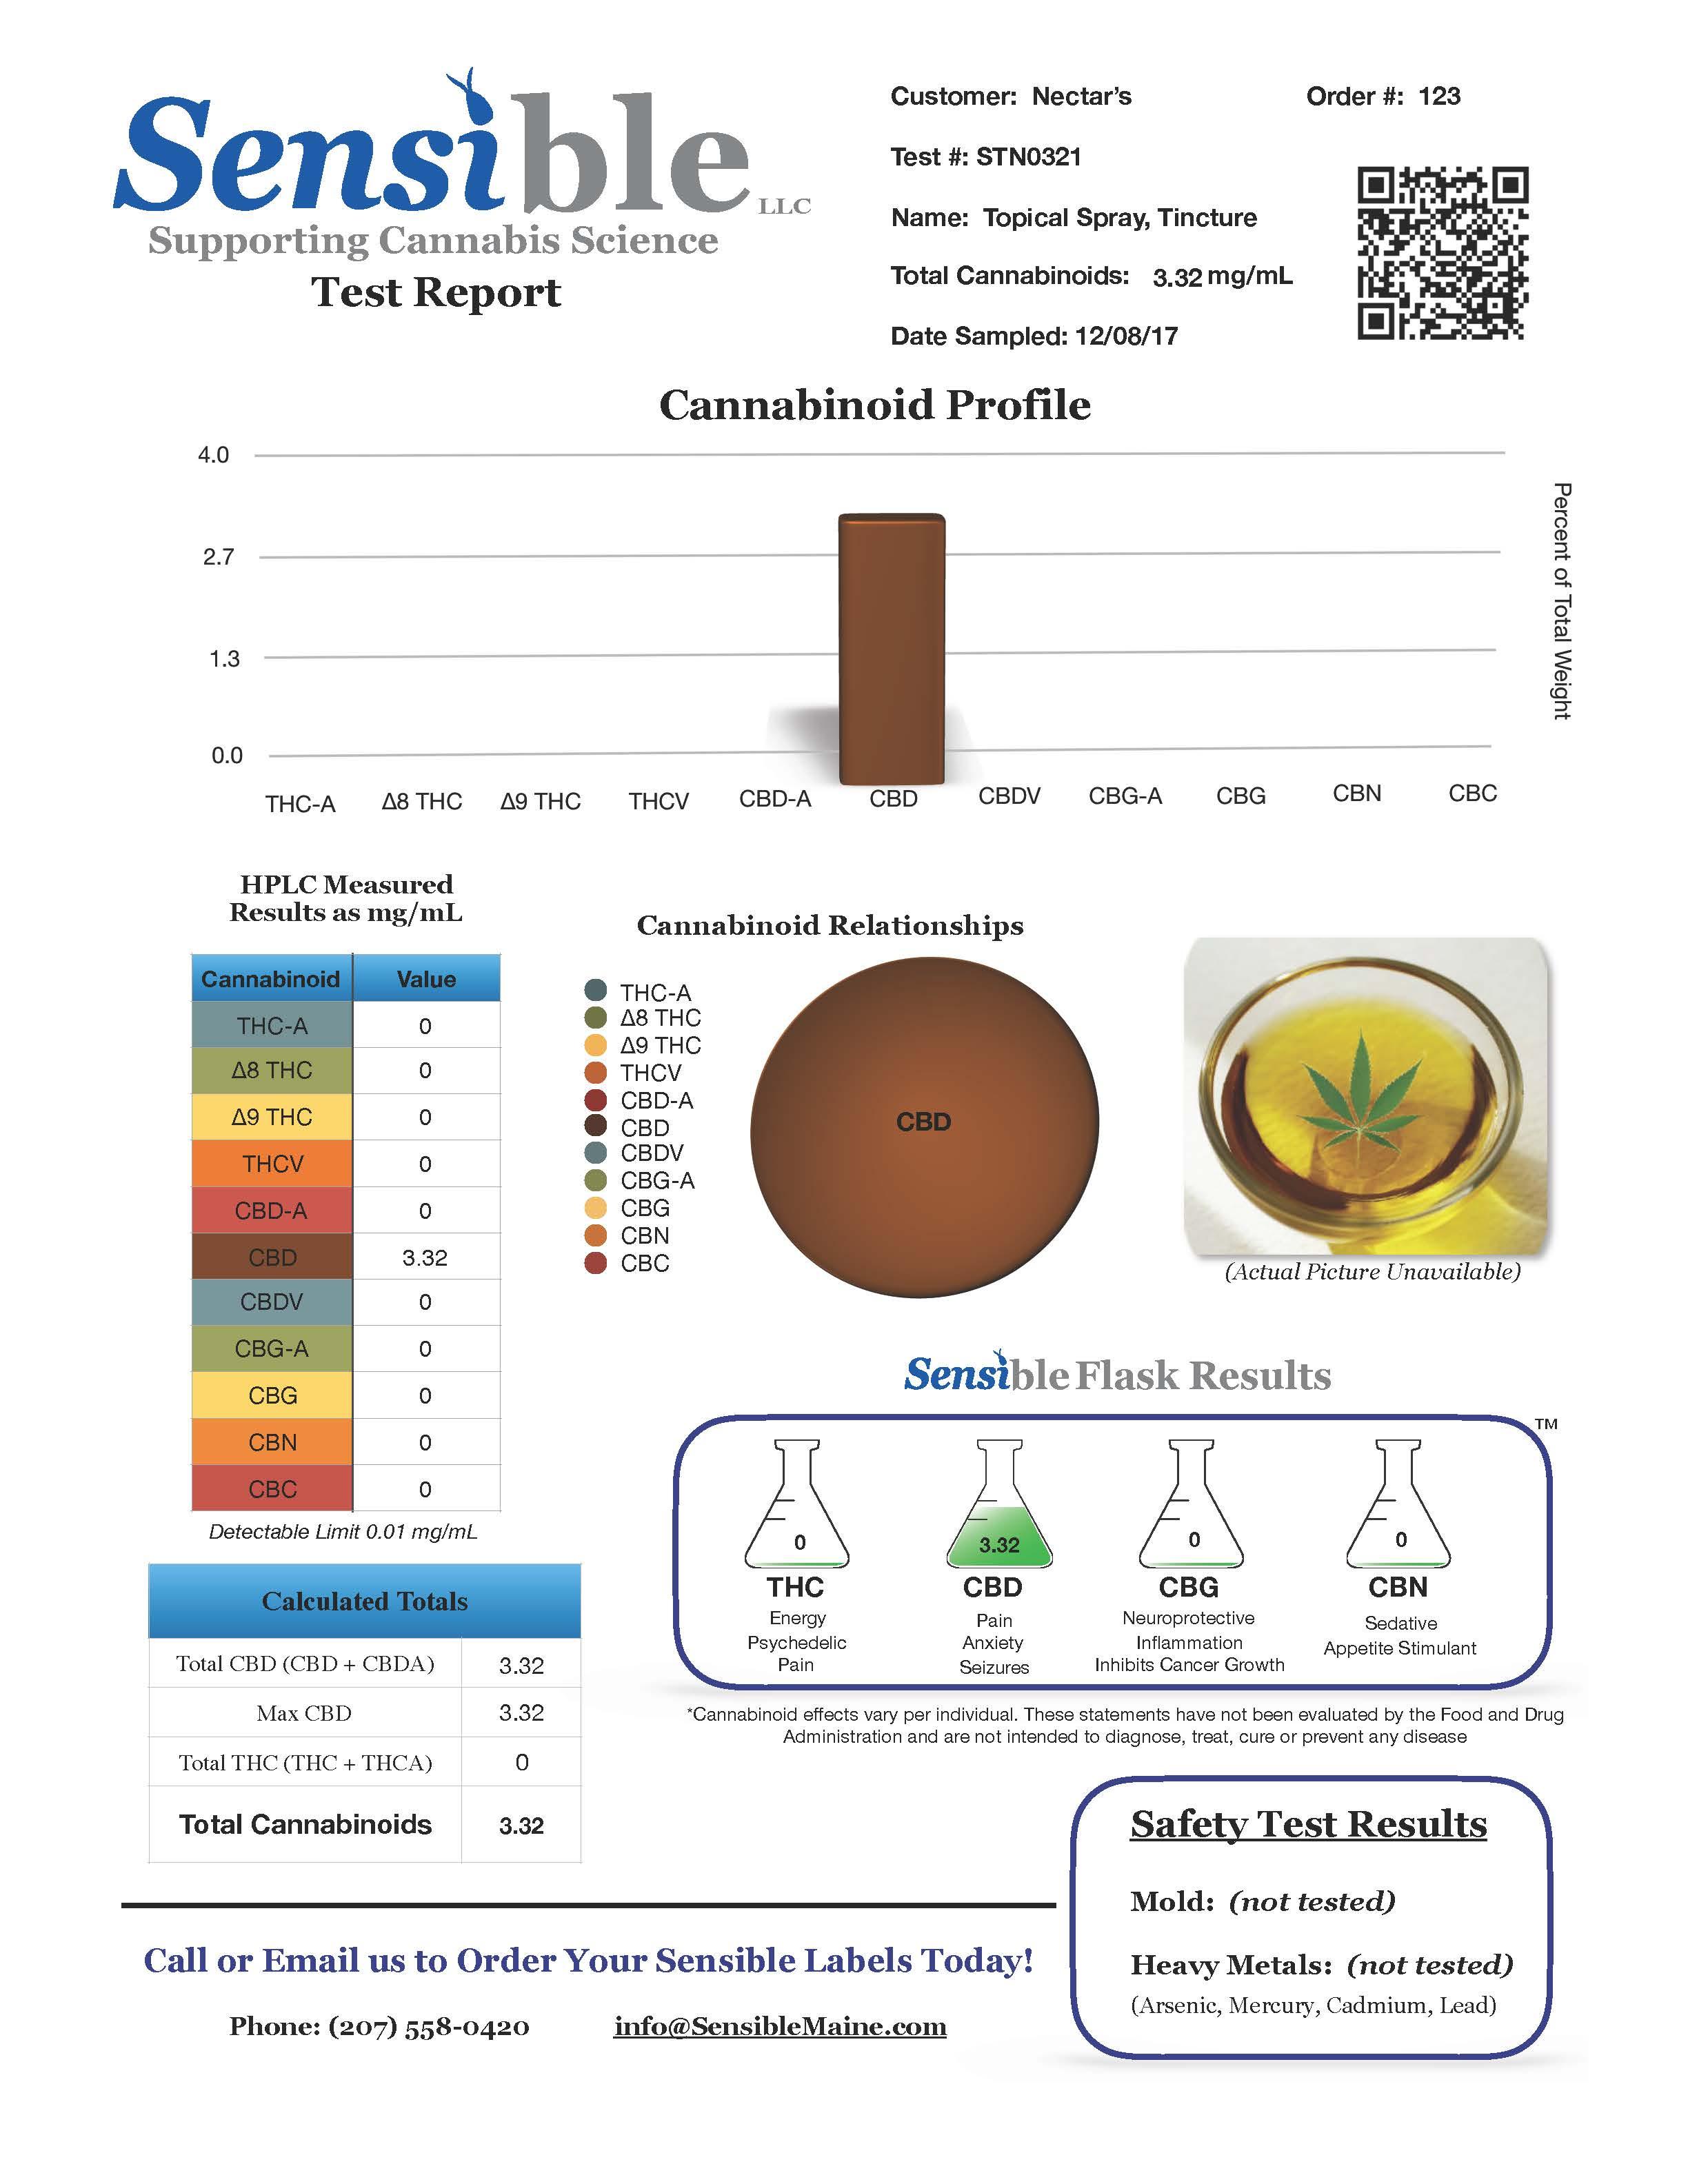 Test Report stn0321.jpg